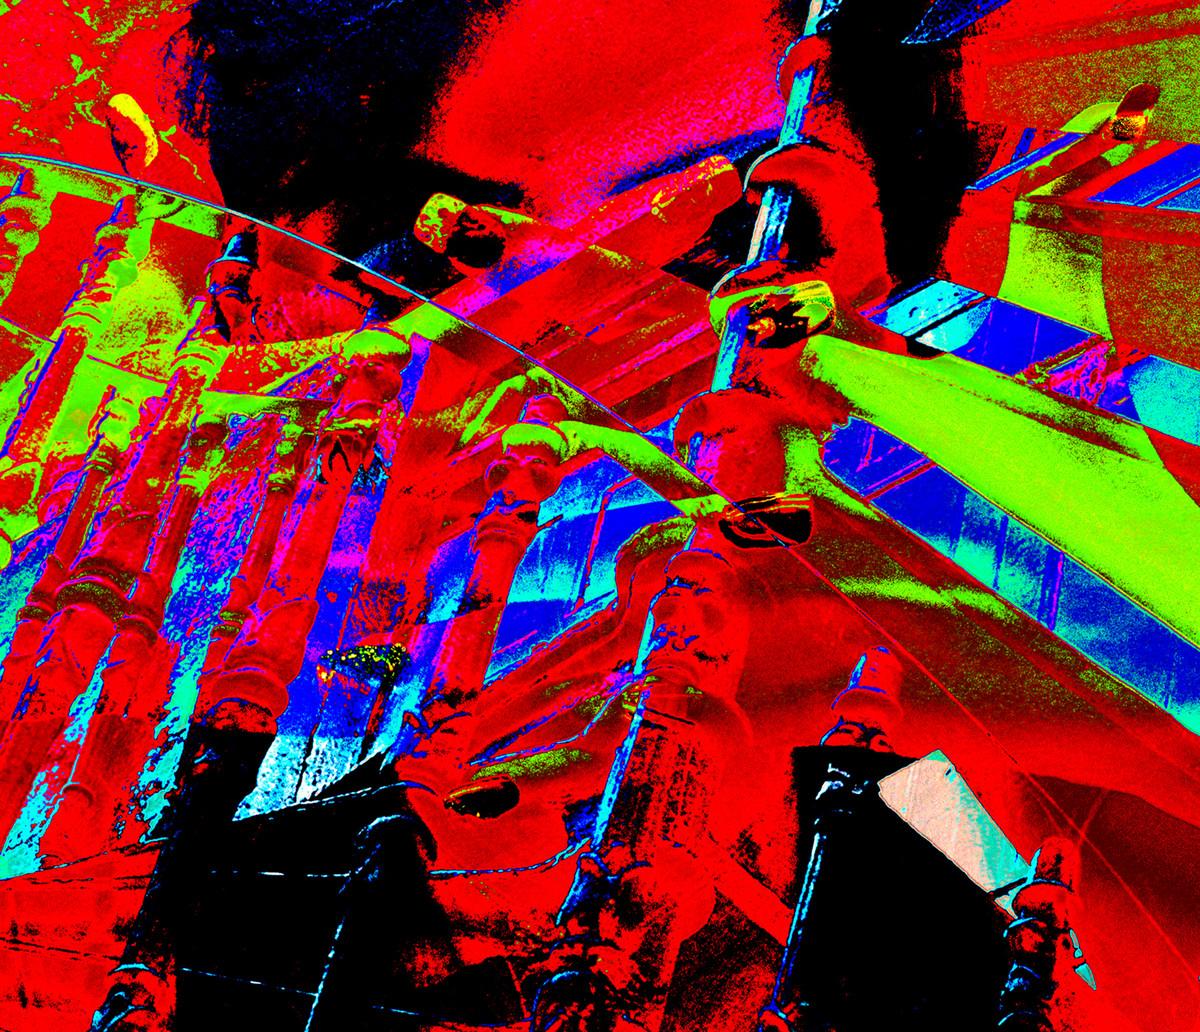 Integration 2 by Ayesha Taleyarkhan, Image Digital Art, Digital Print on Archival Paper, Monza color